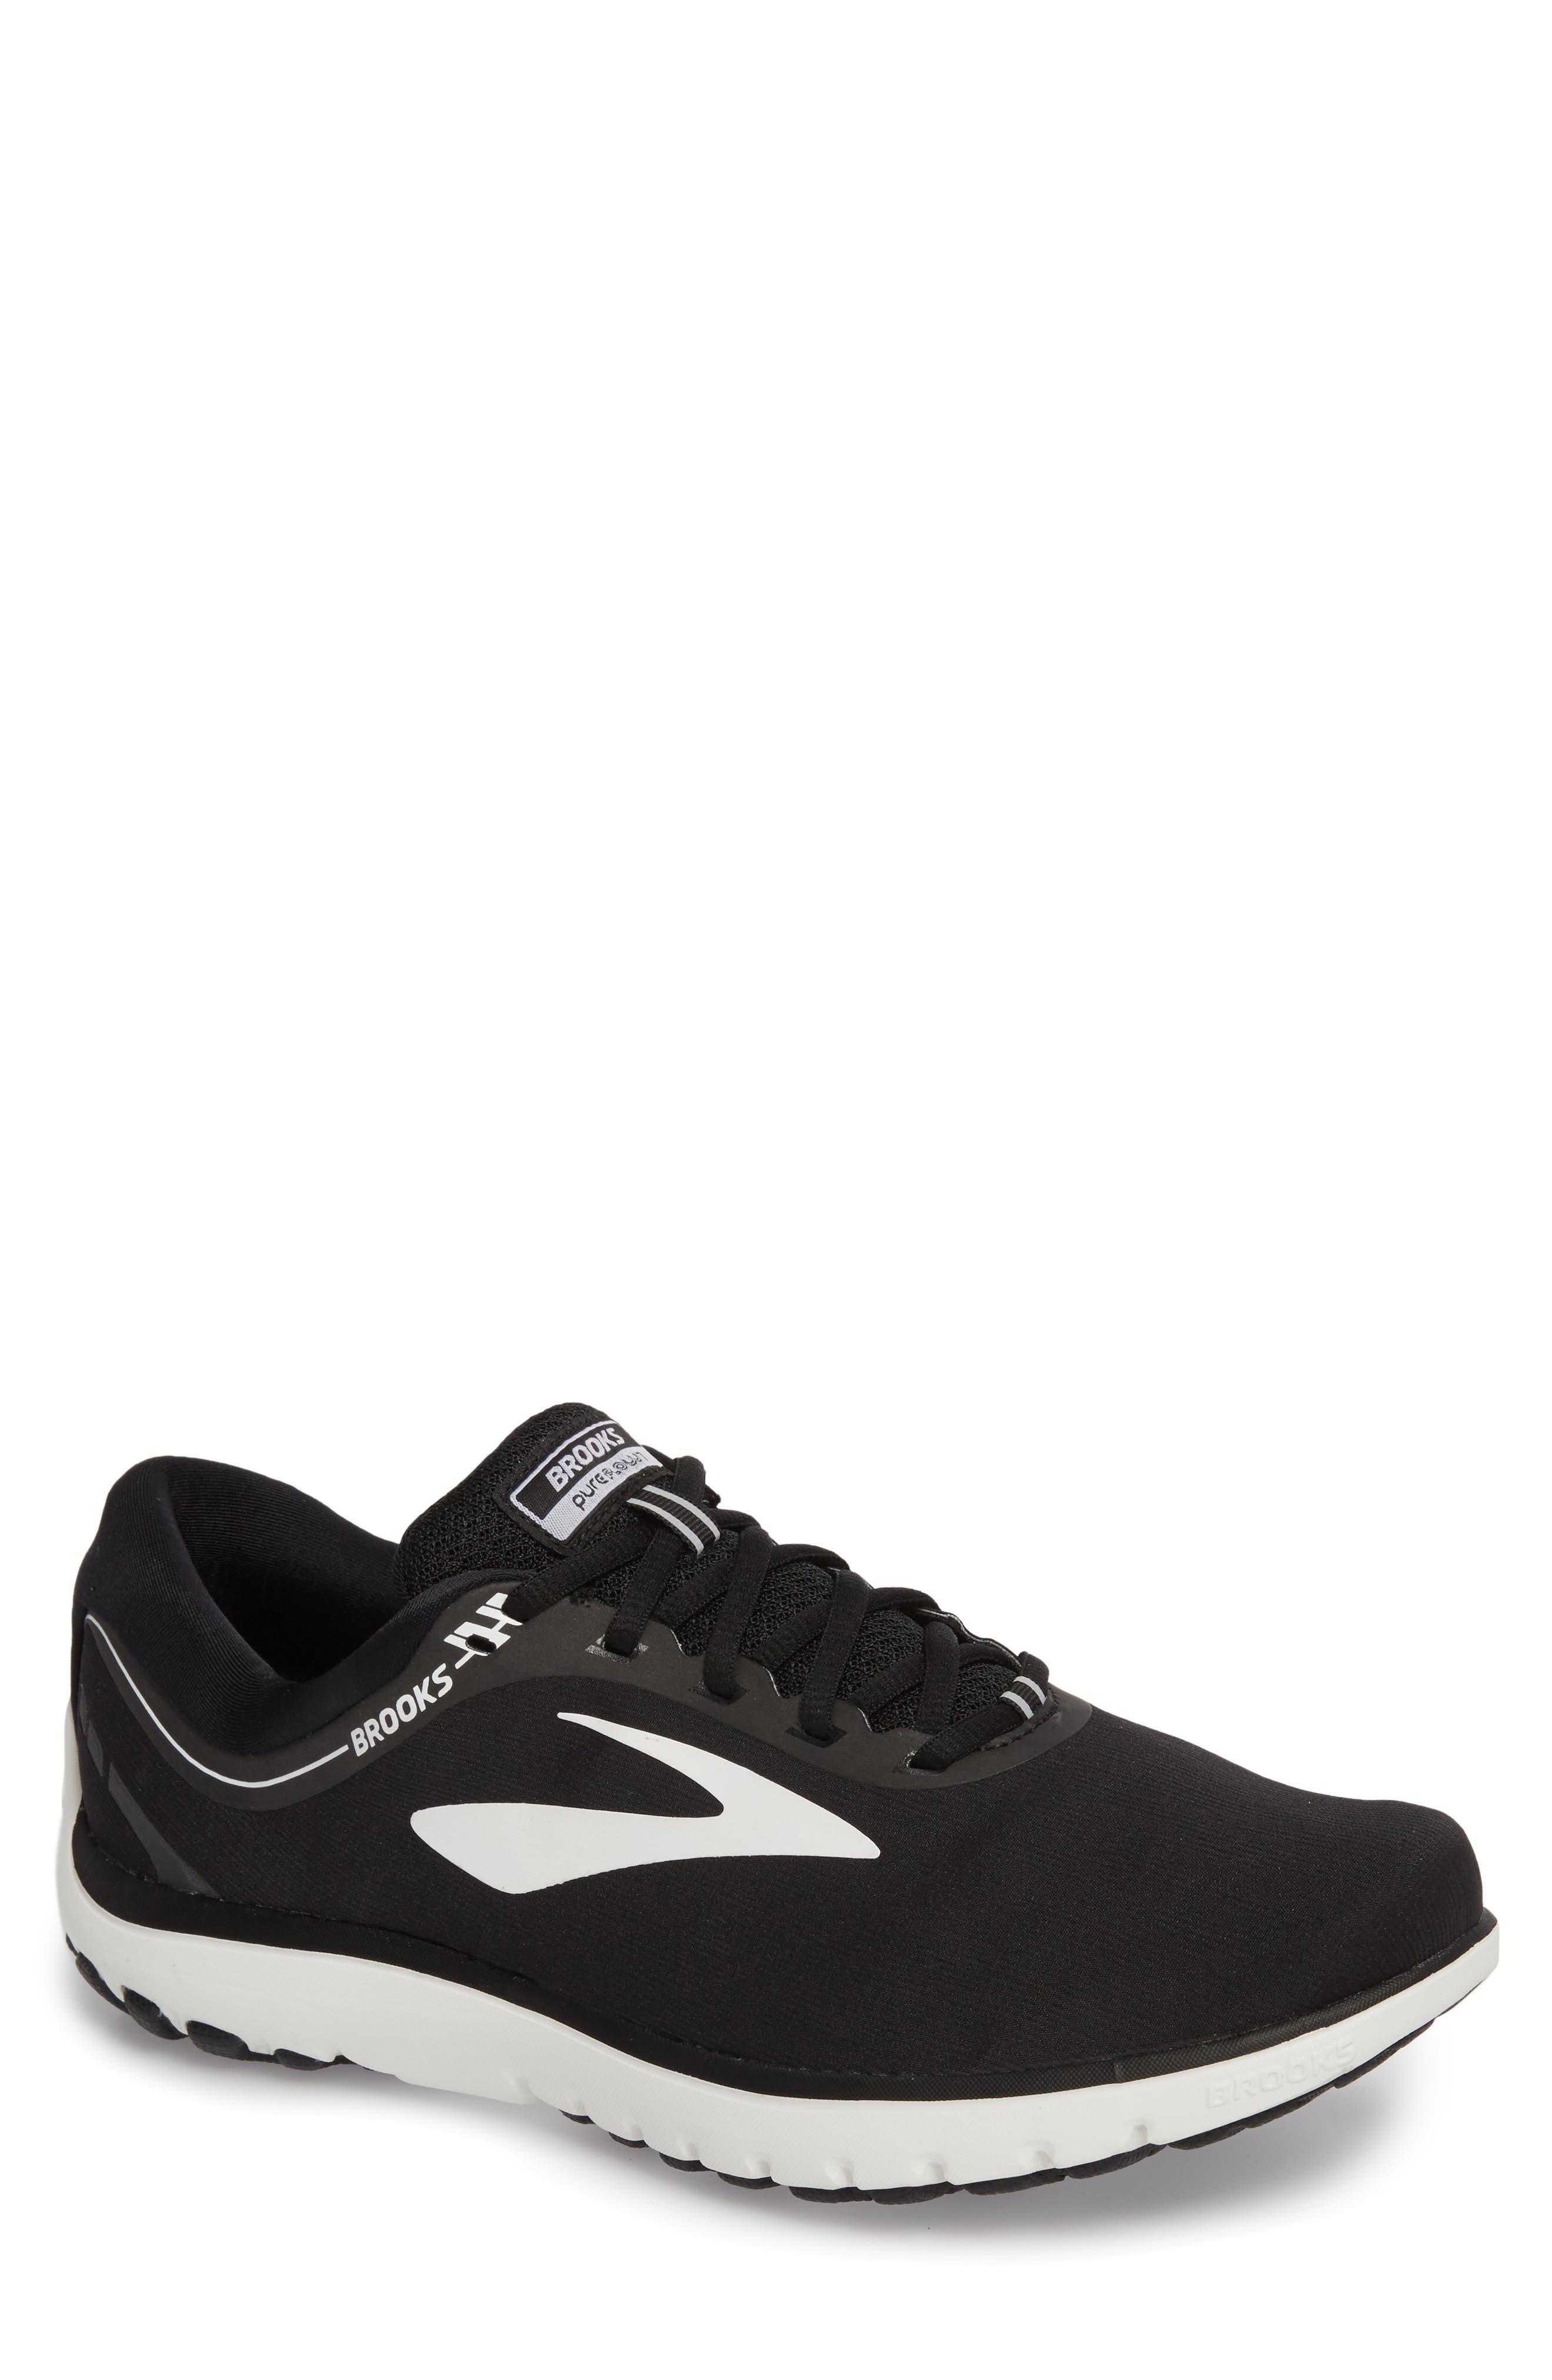 28868221762 Men s Brooks Sneakers